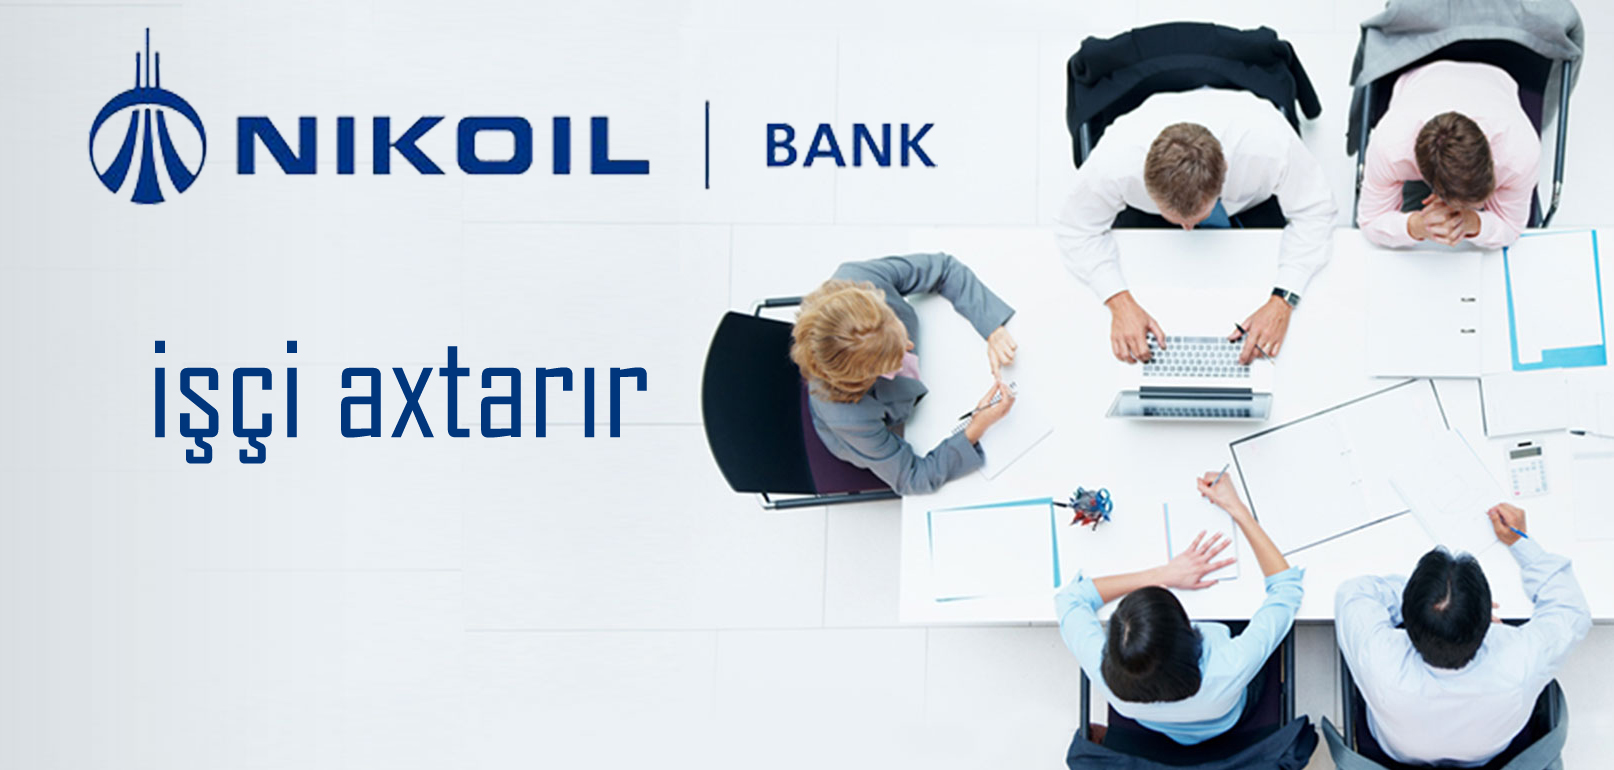 Nikoil Bankda İŞ VAR! - 15 Yeni VAKANSİYA